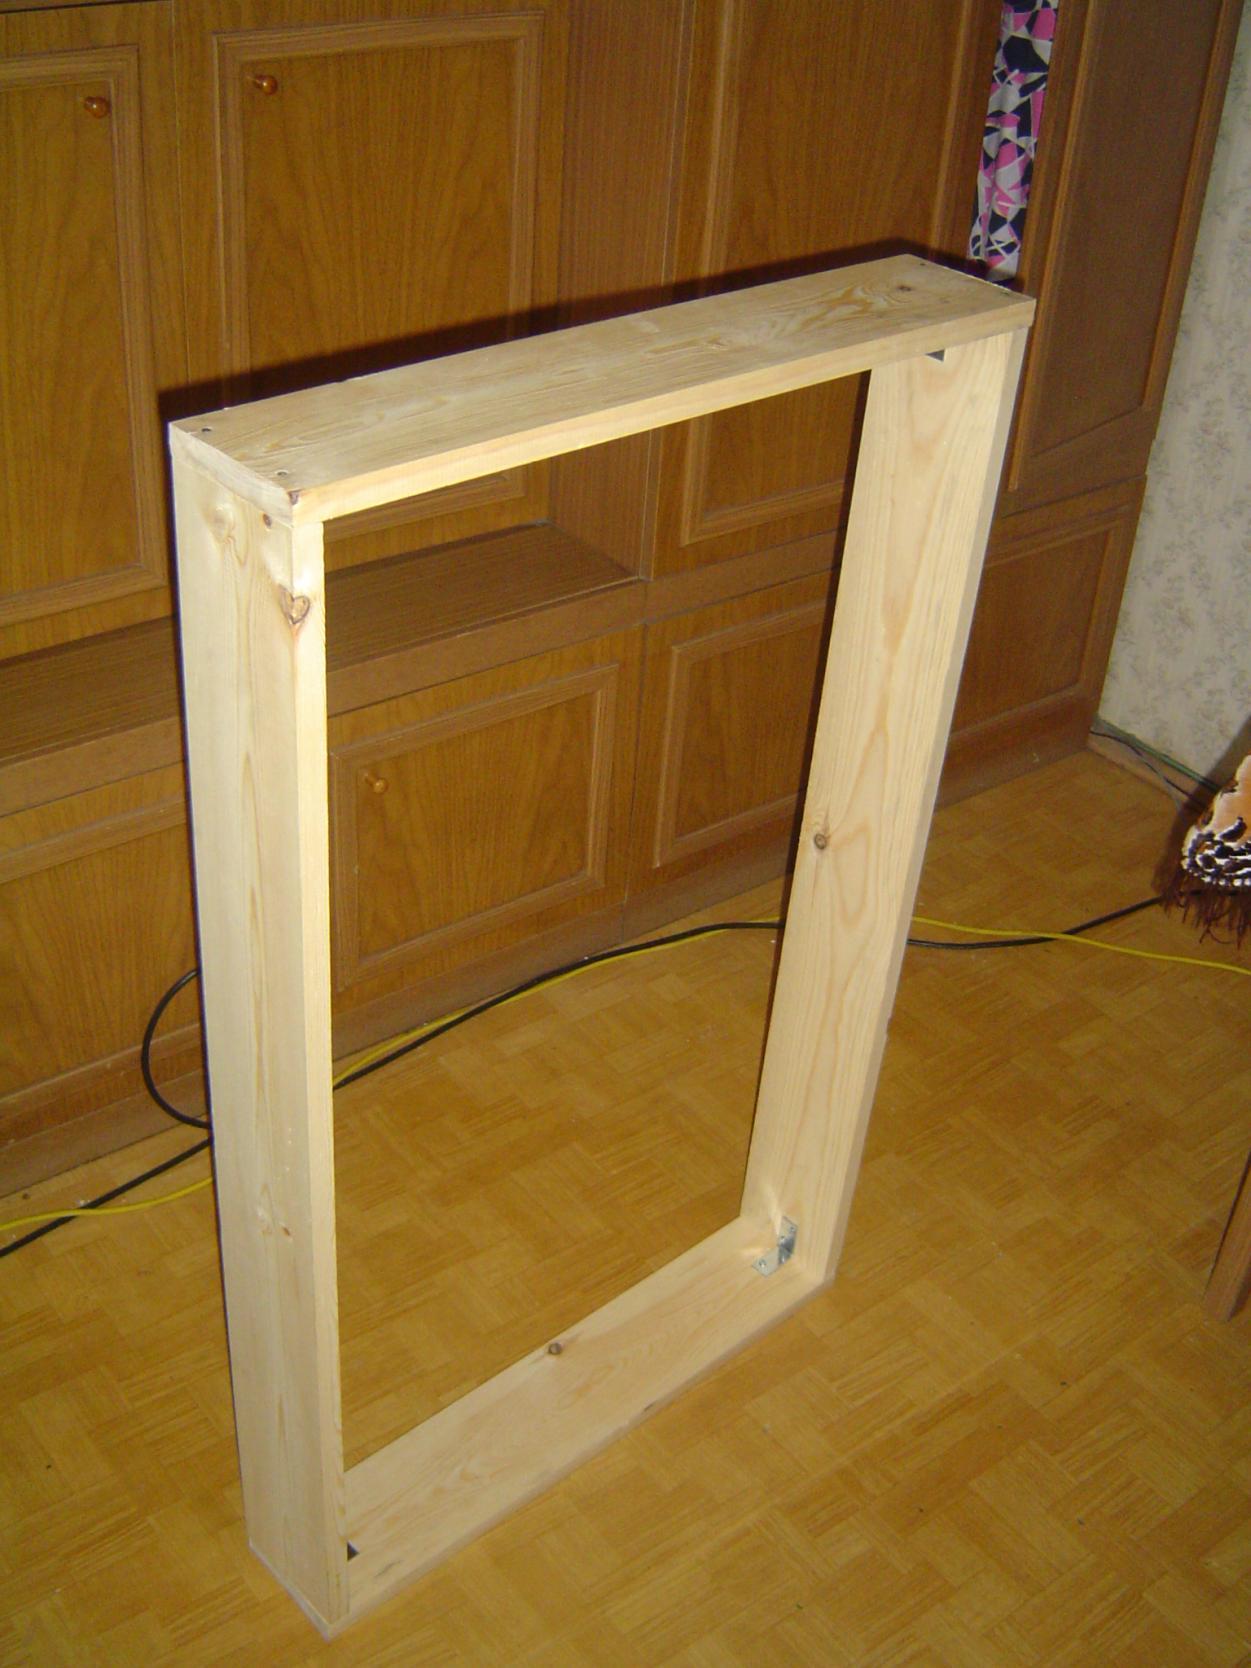 How i build my acoustic panel - Gearslutz